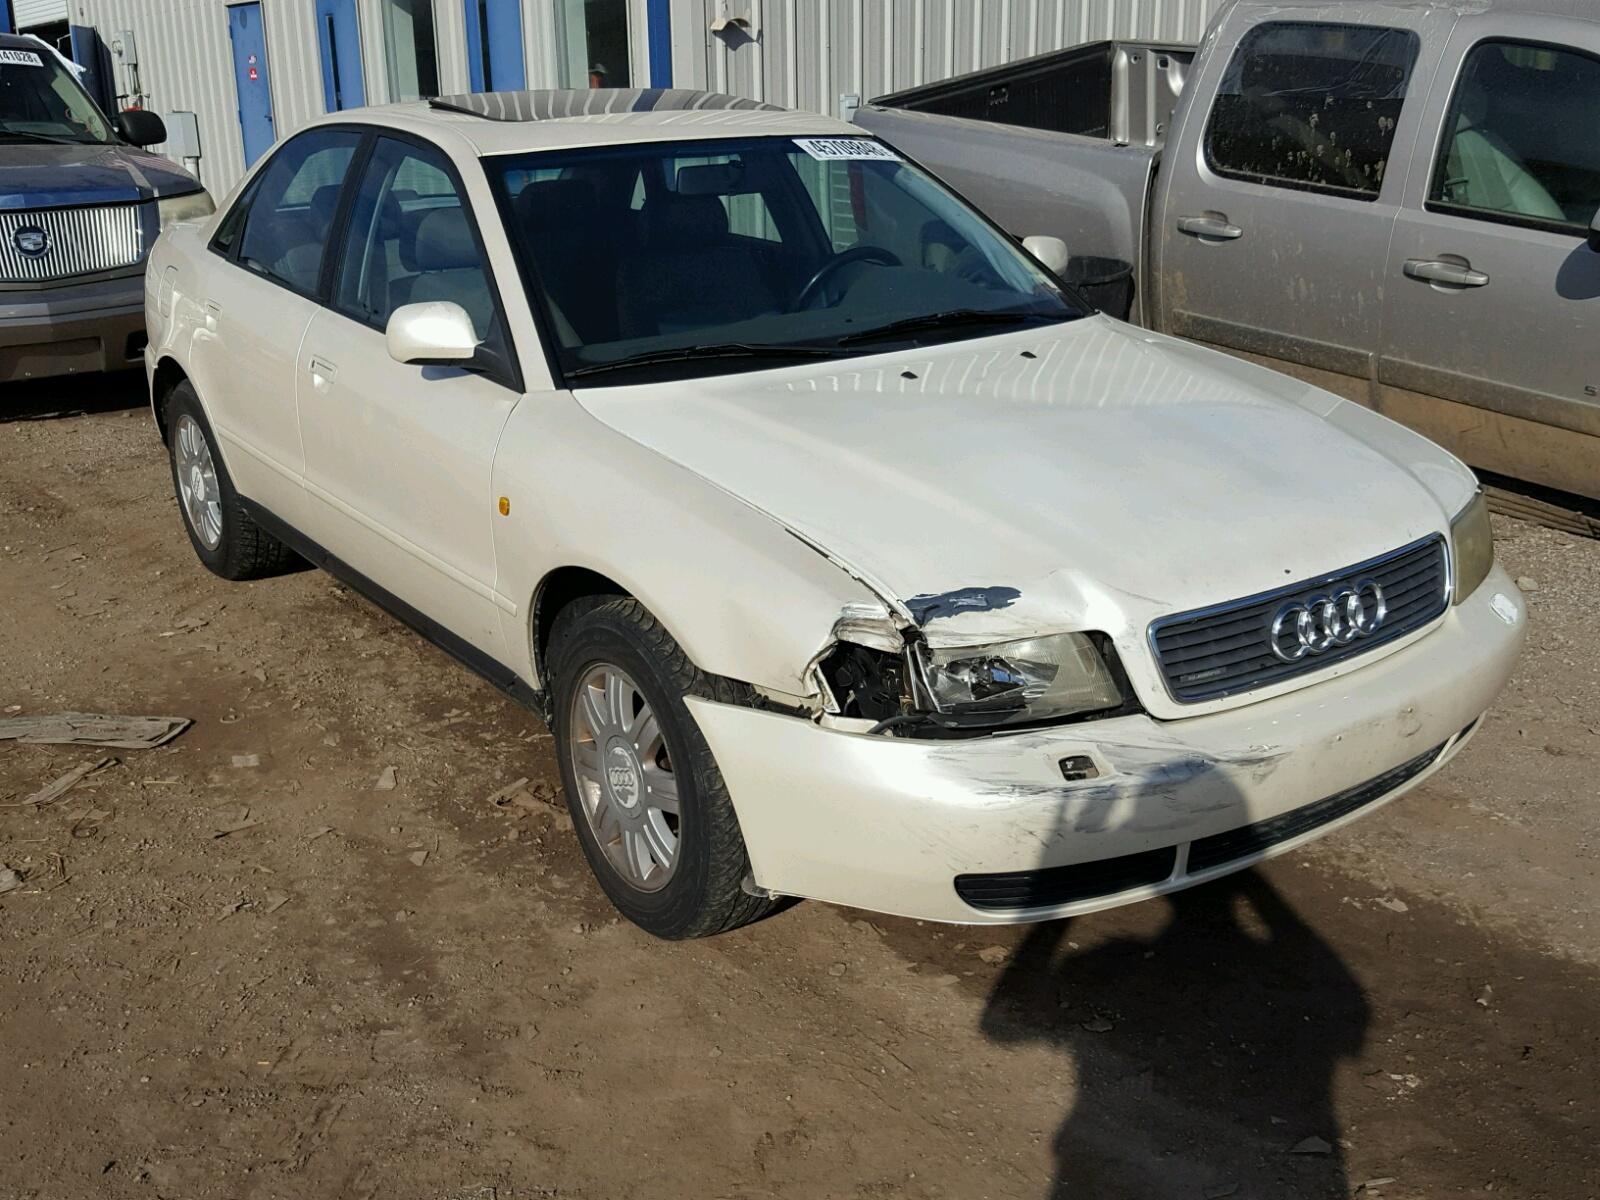 Audi A T Quattro For Sale At Copart Louisville KY Lot - 1998 audi a4